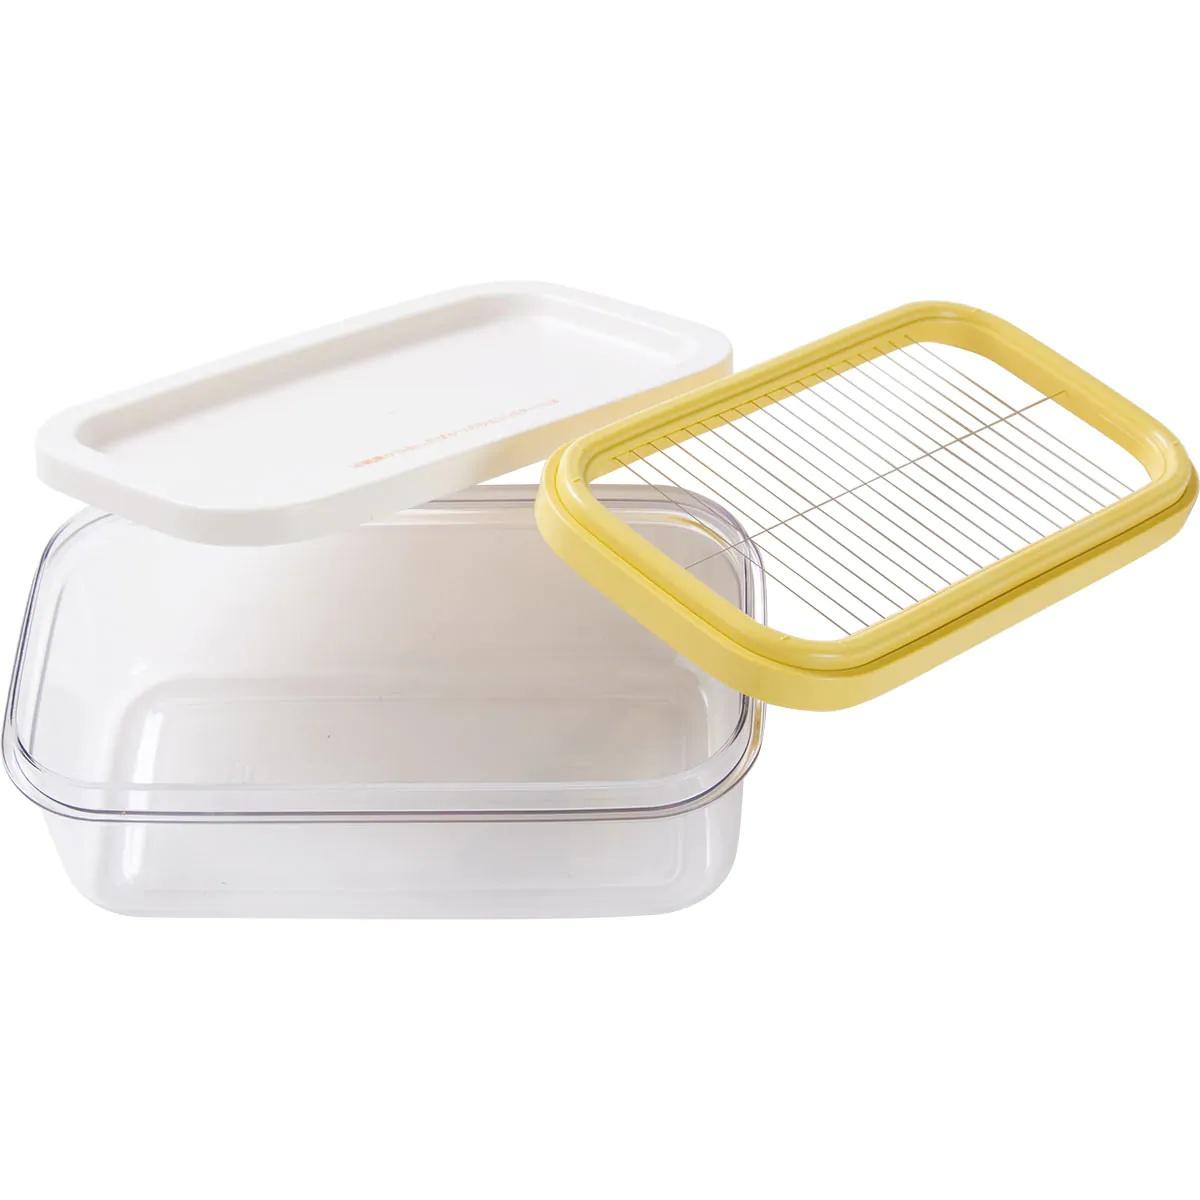 NITORI(ニトリ) バターケースの商品画像12